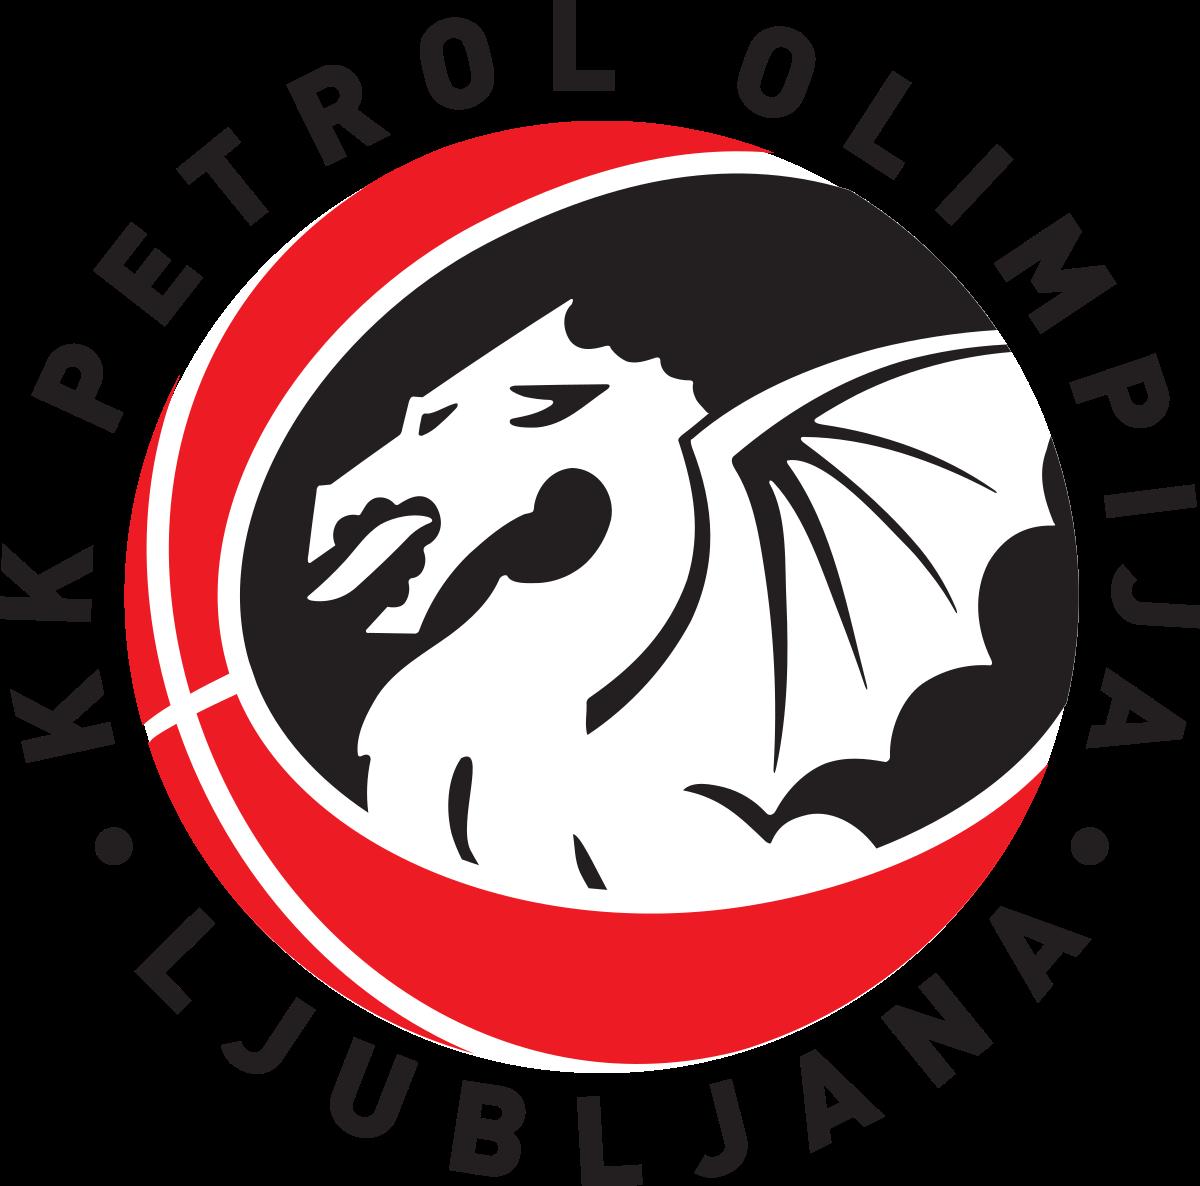 Dragons basketball clipart image royalty free KK Olimpija - Wikipedia image royalty free